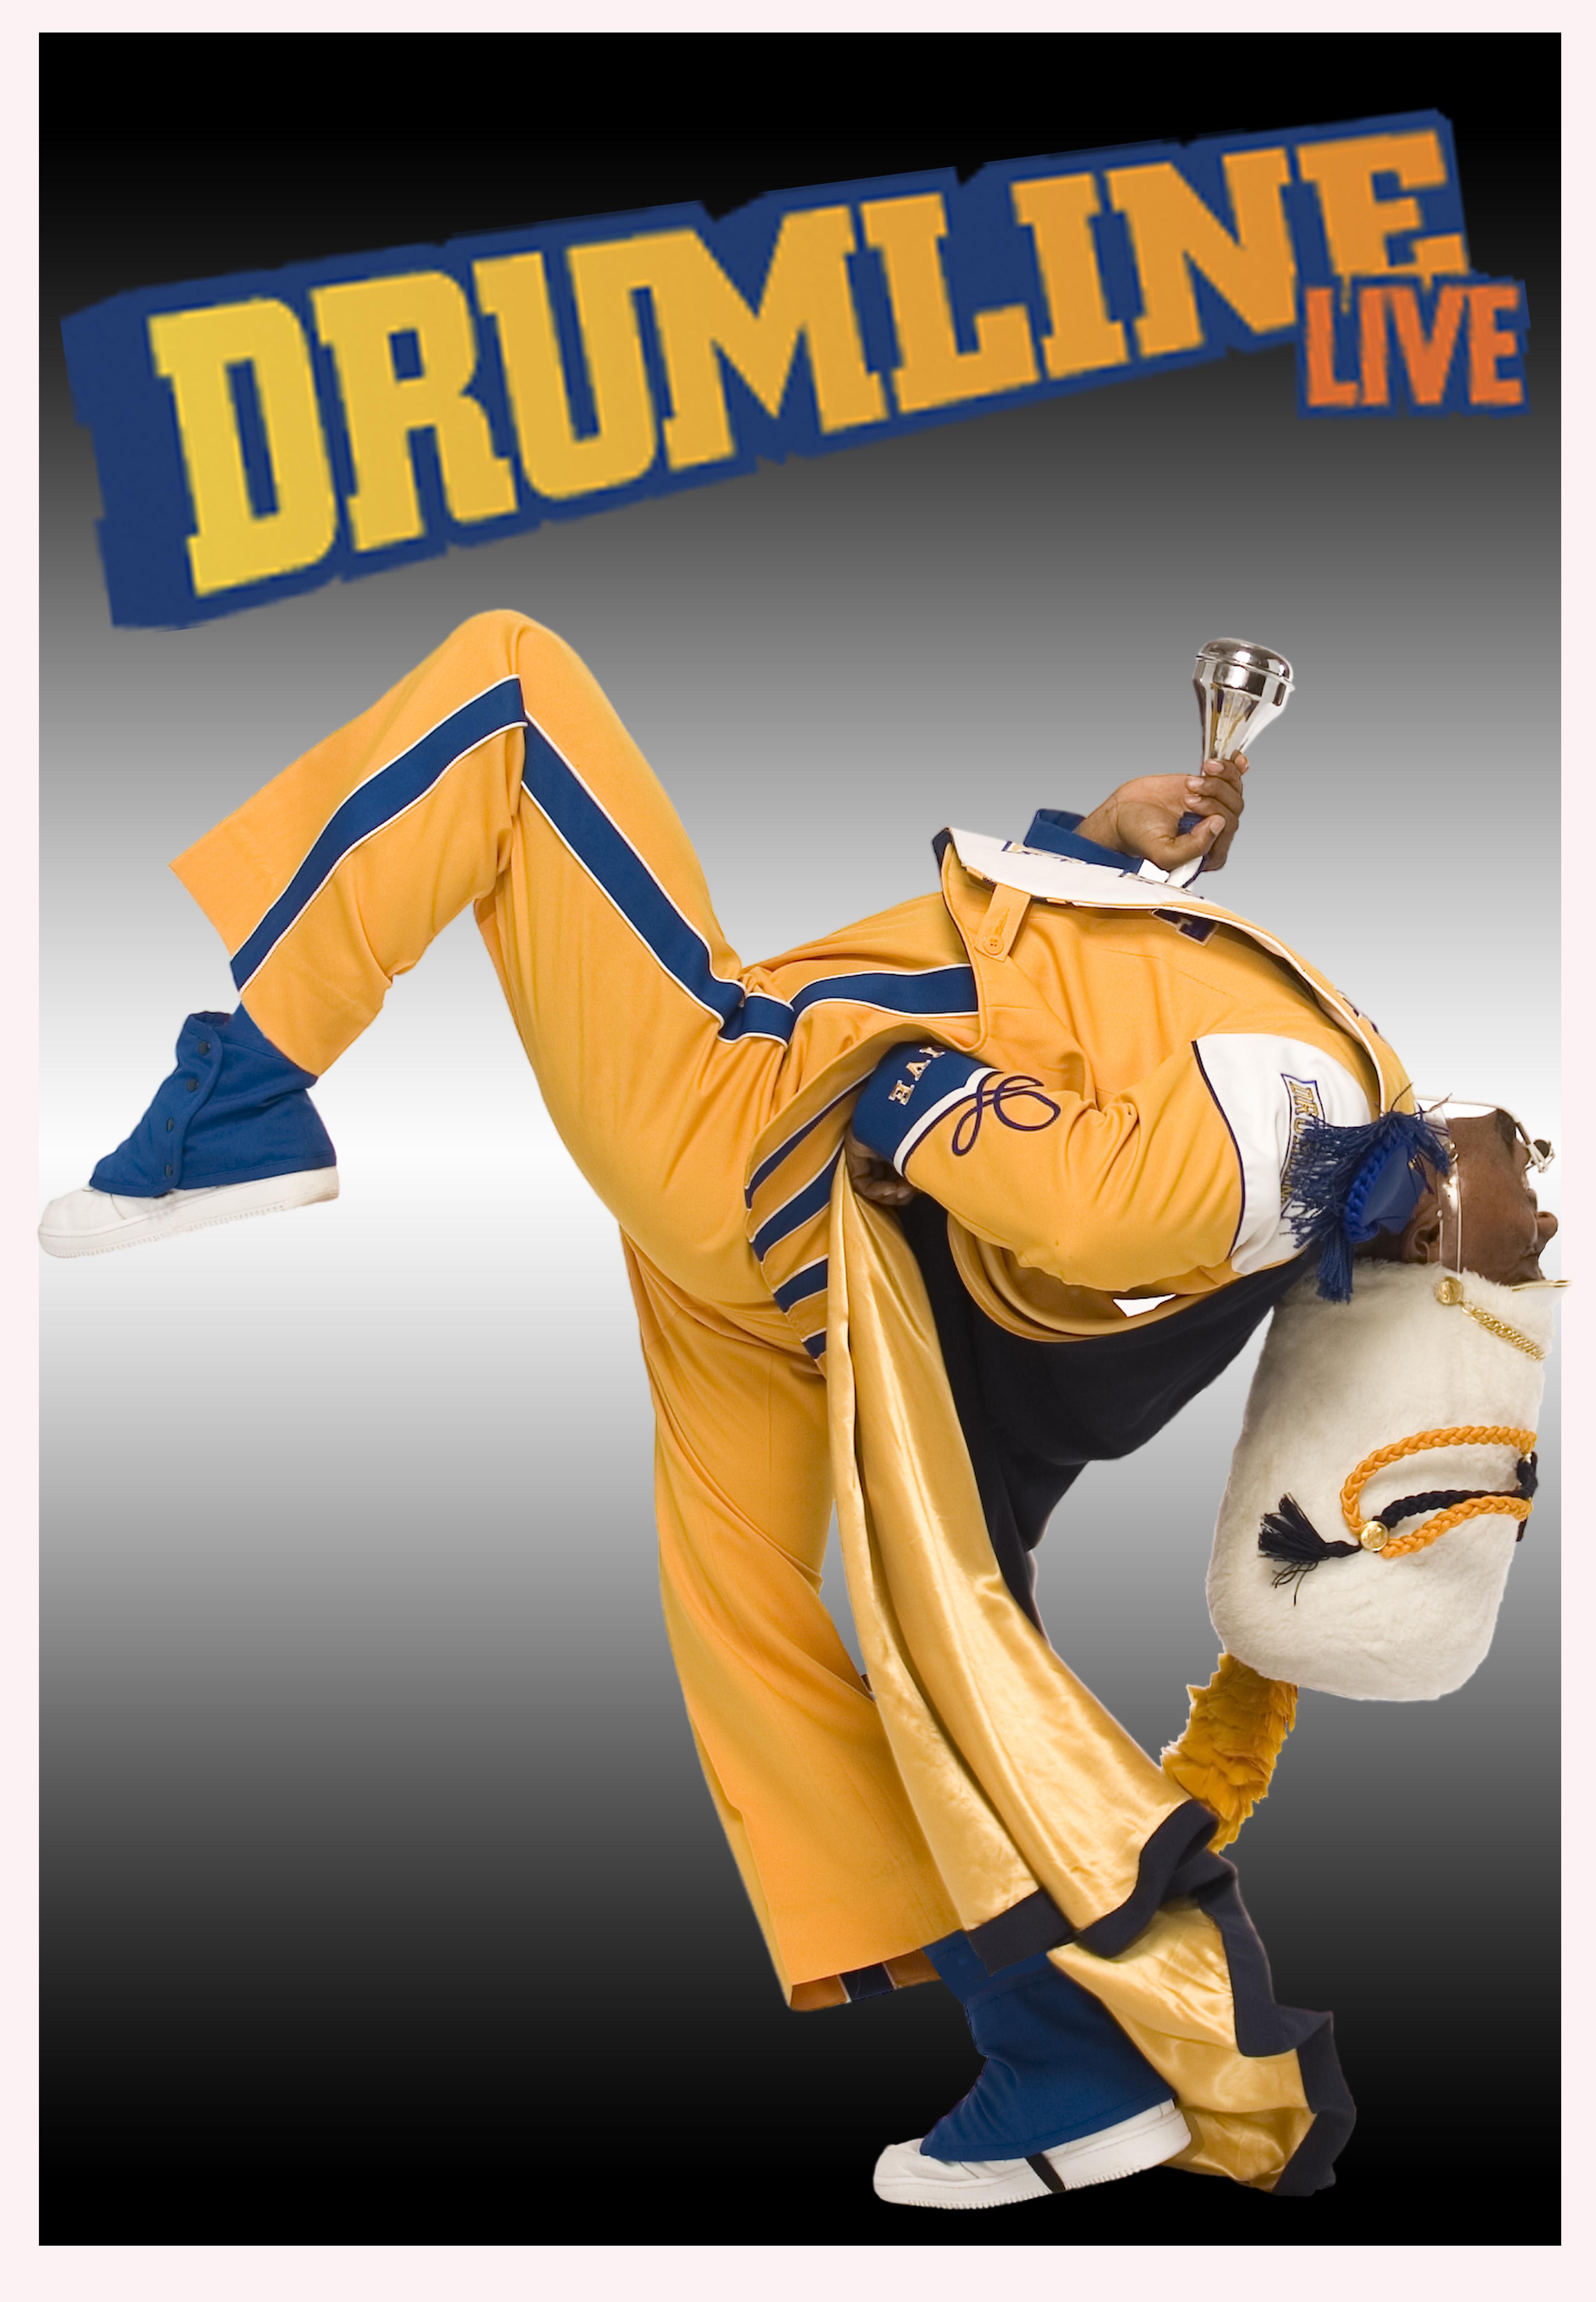 2011 Drumline Live Show